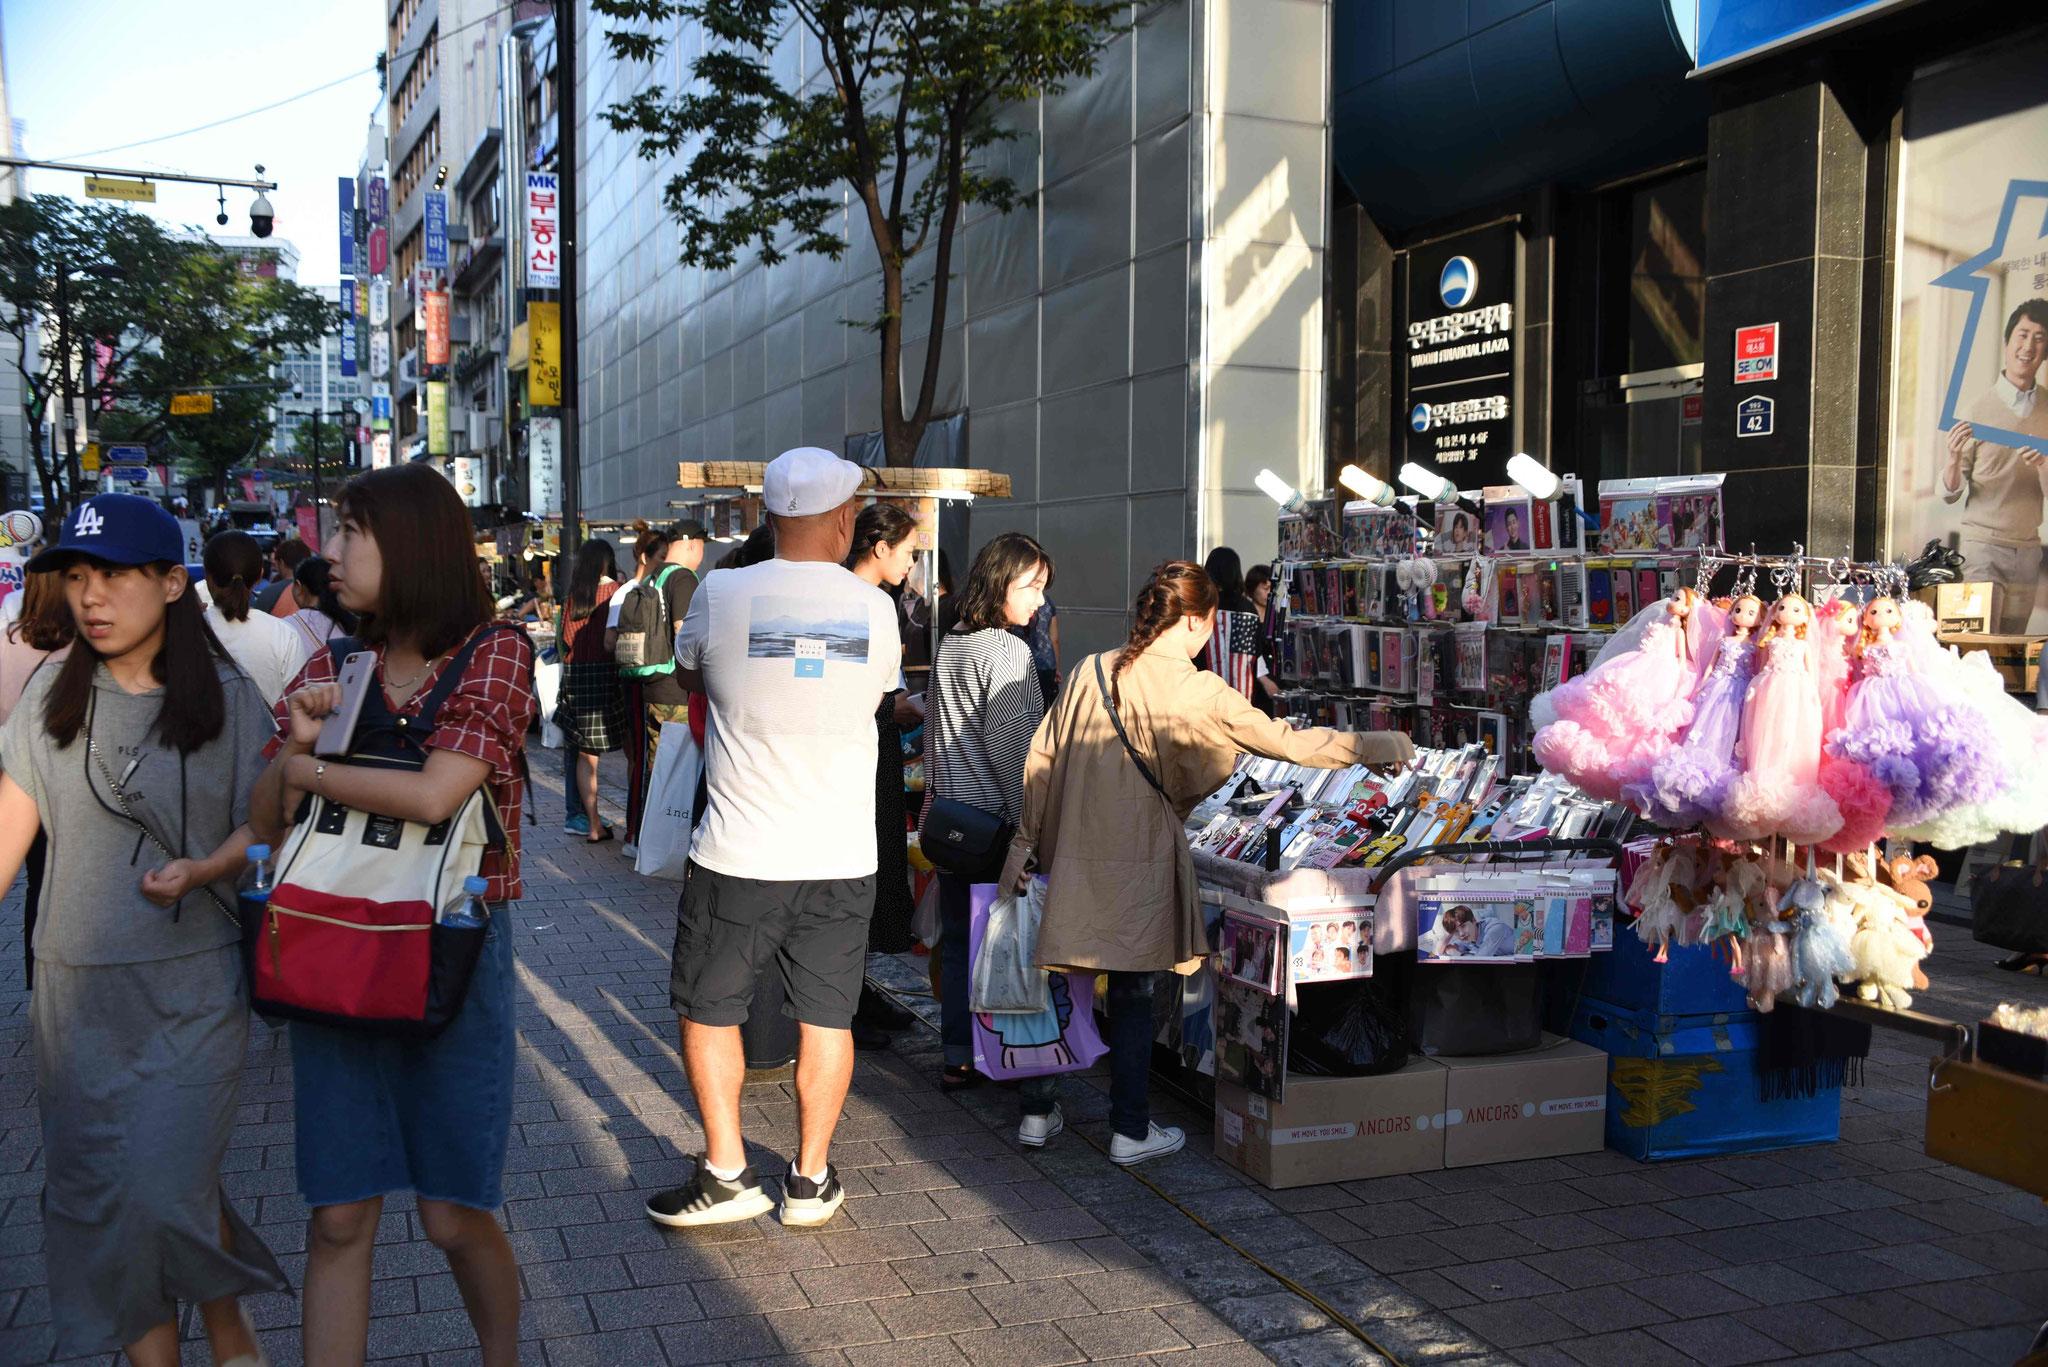 Straßenverkaufsstand